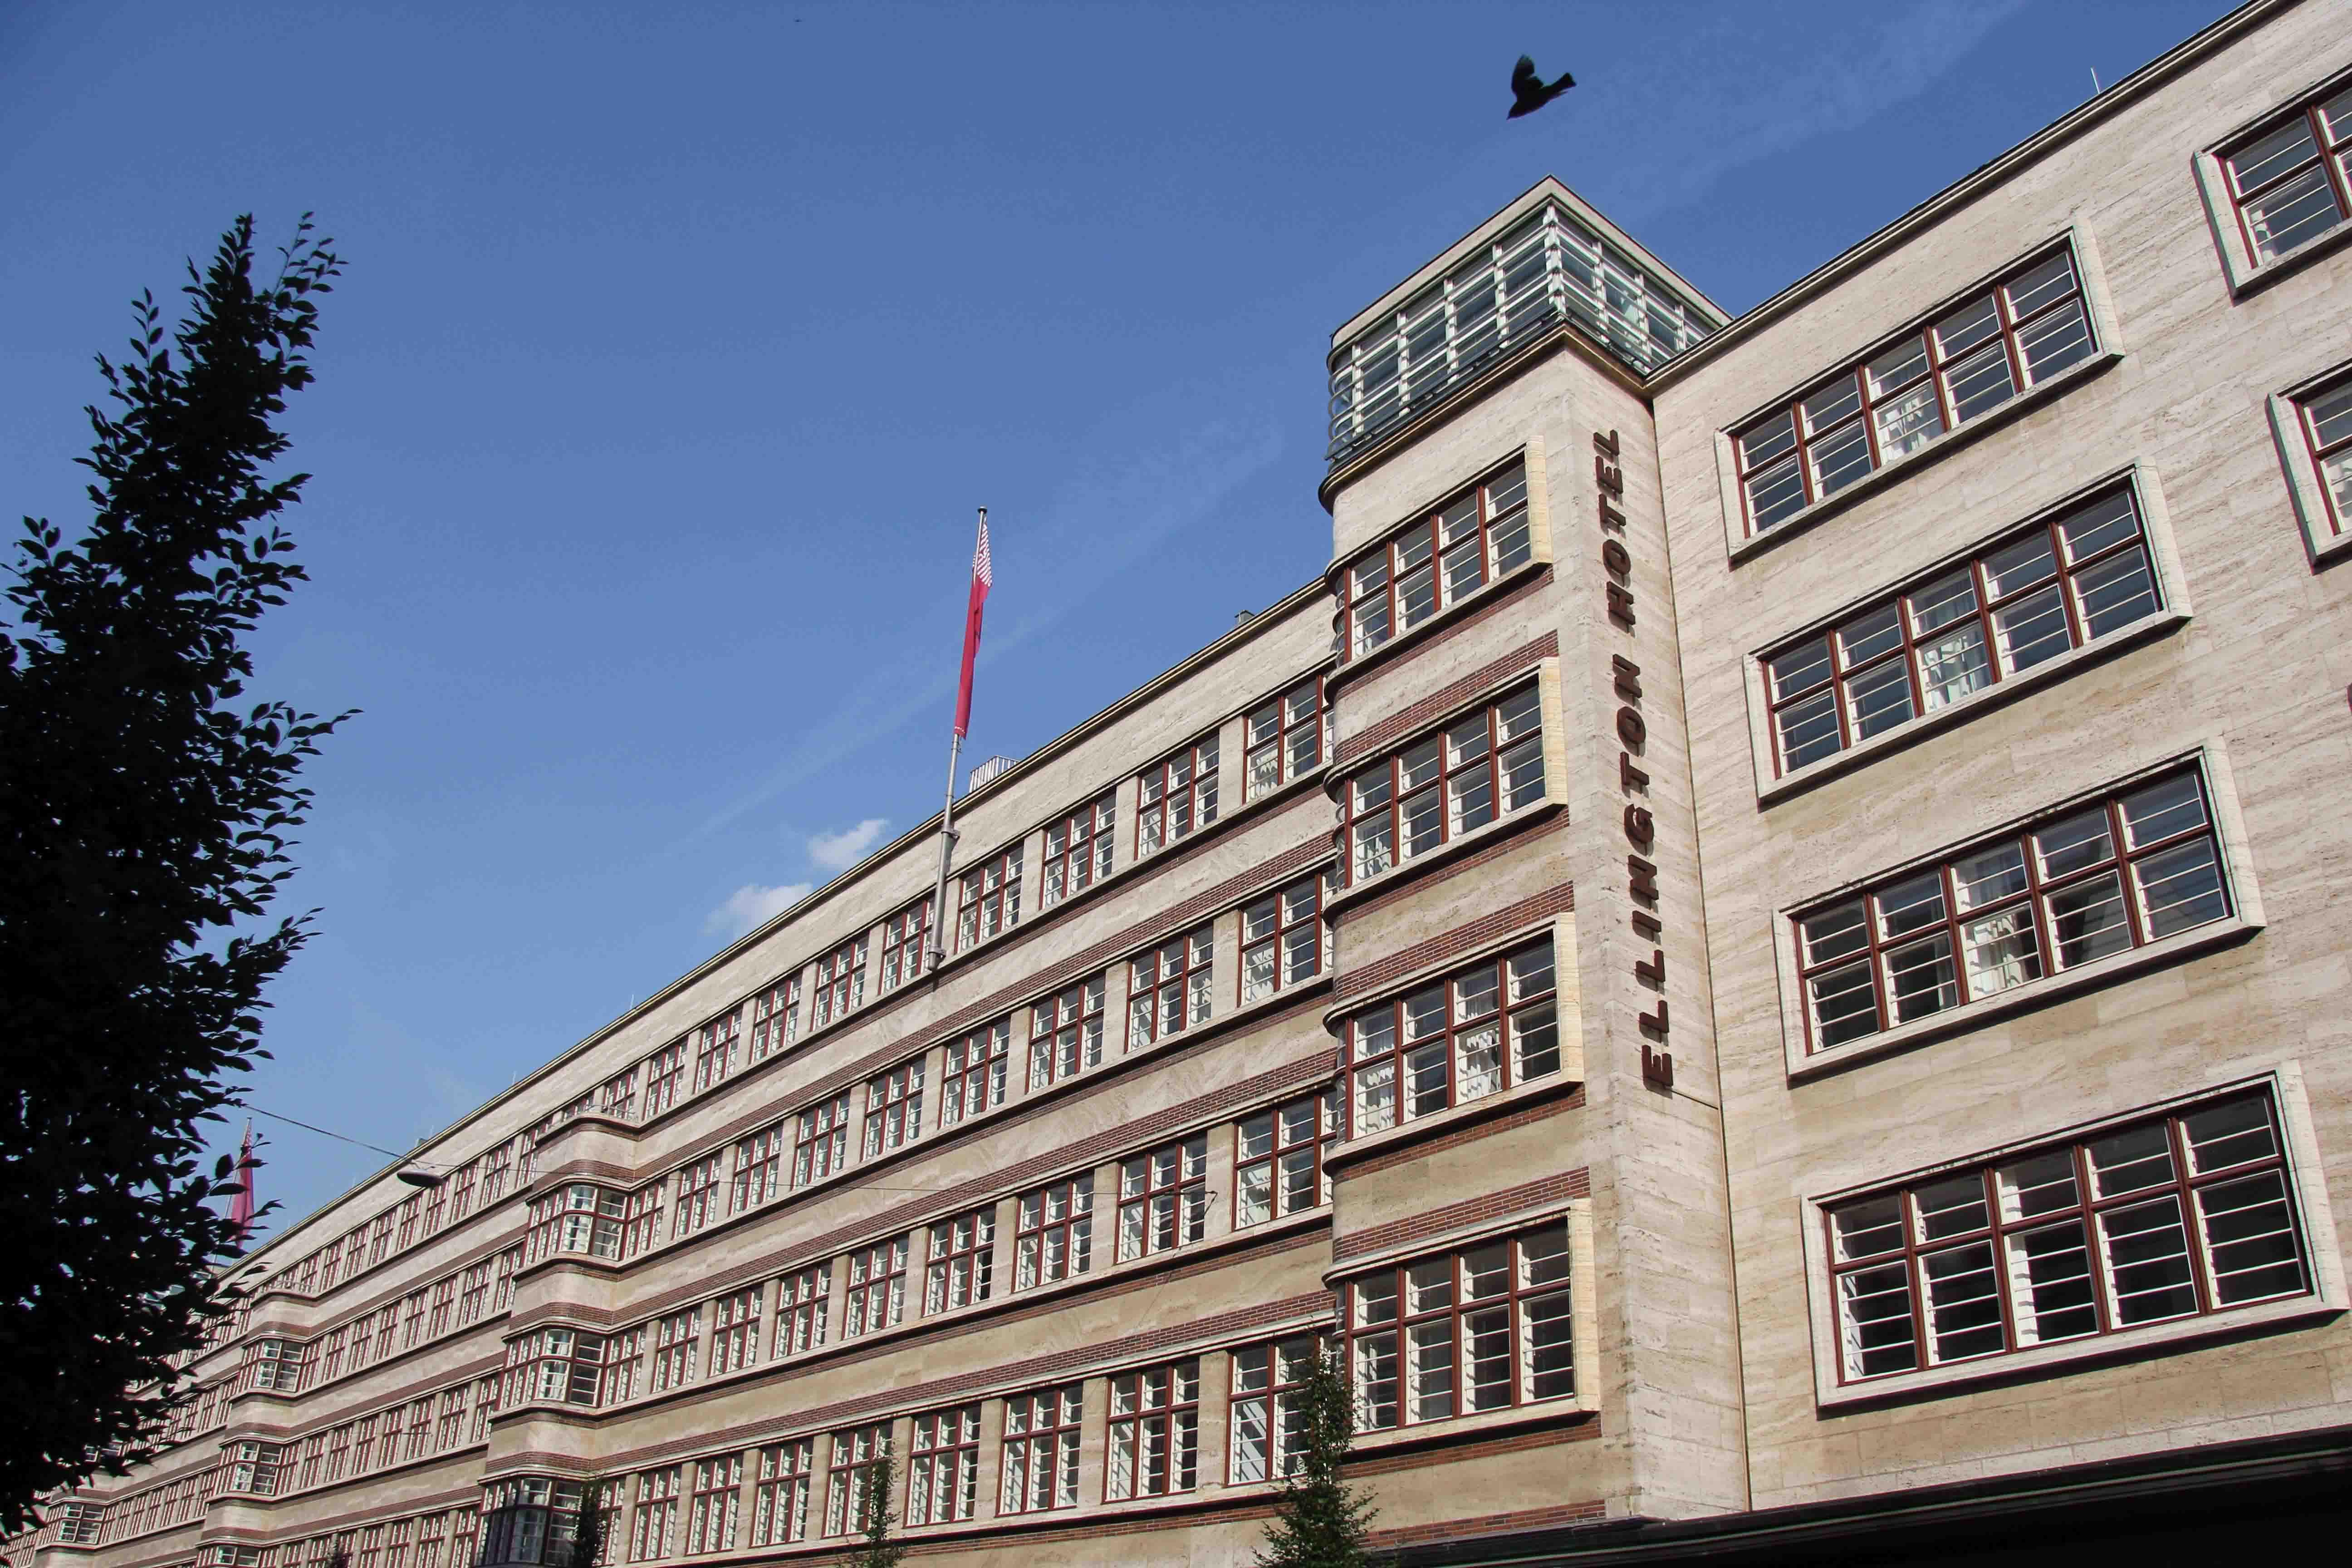 Berlin Hotel Ellington Karten Veranstaltung